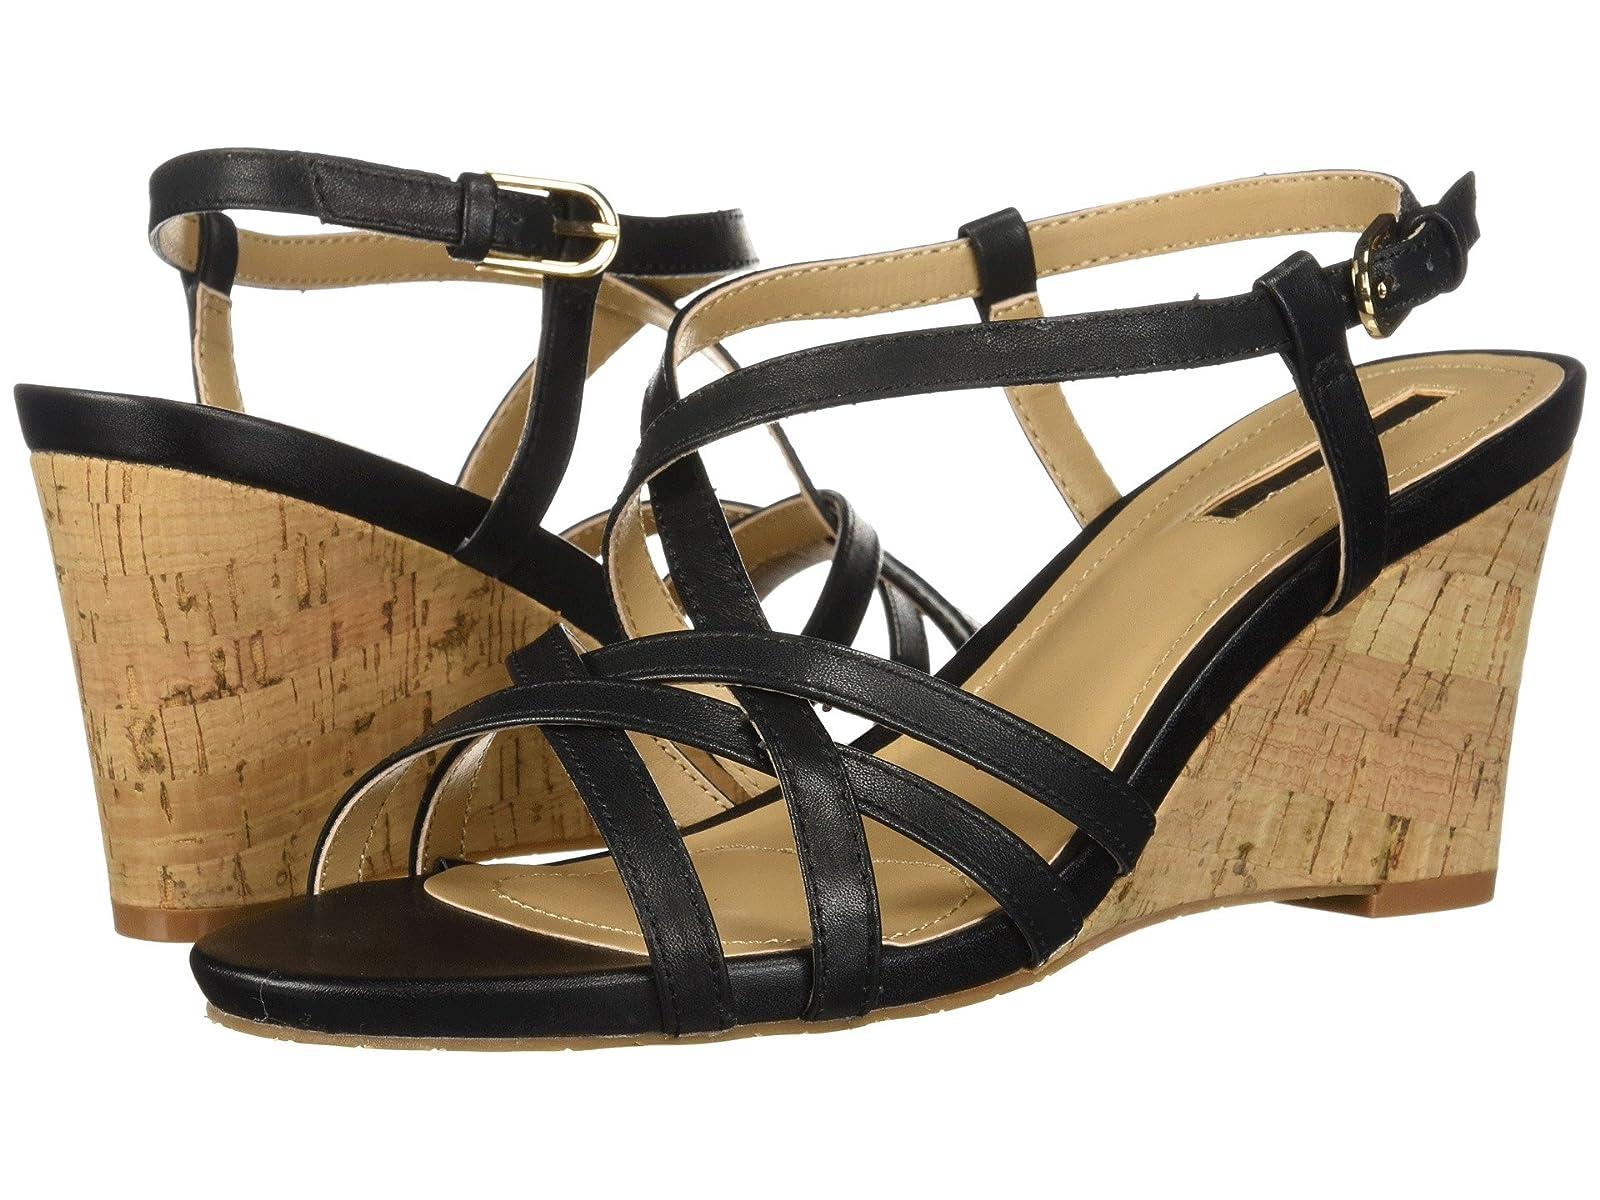 Tahari FutureAtmospheric grades have affordable shoes